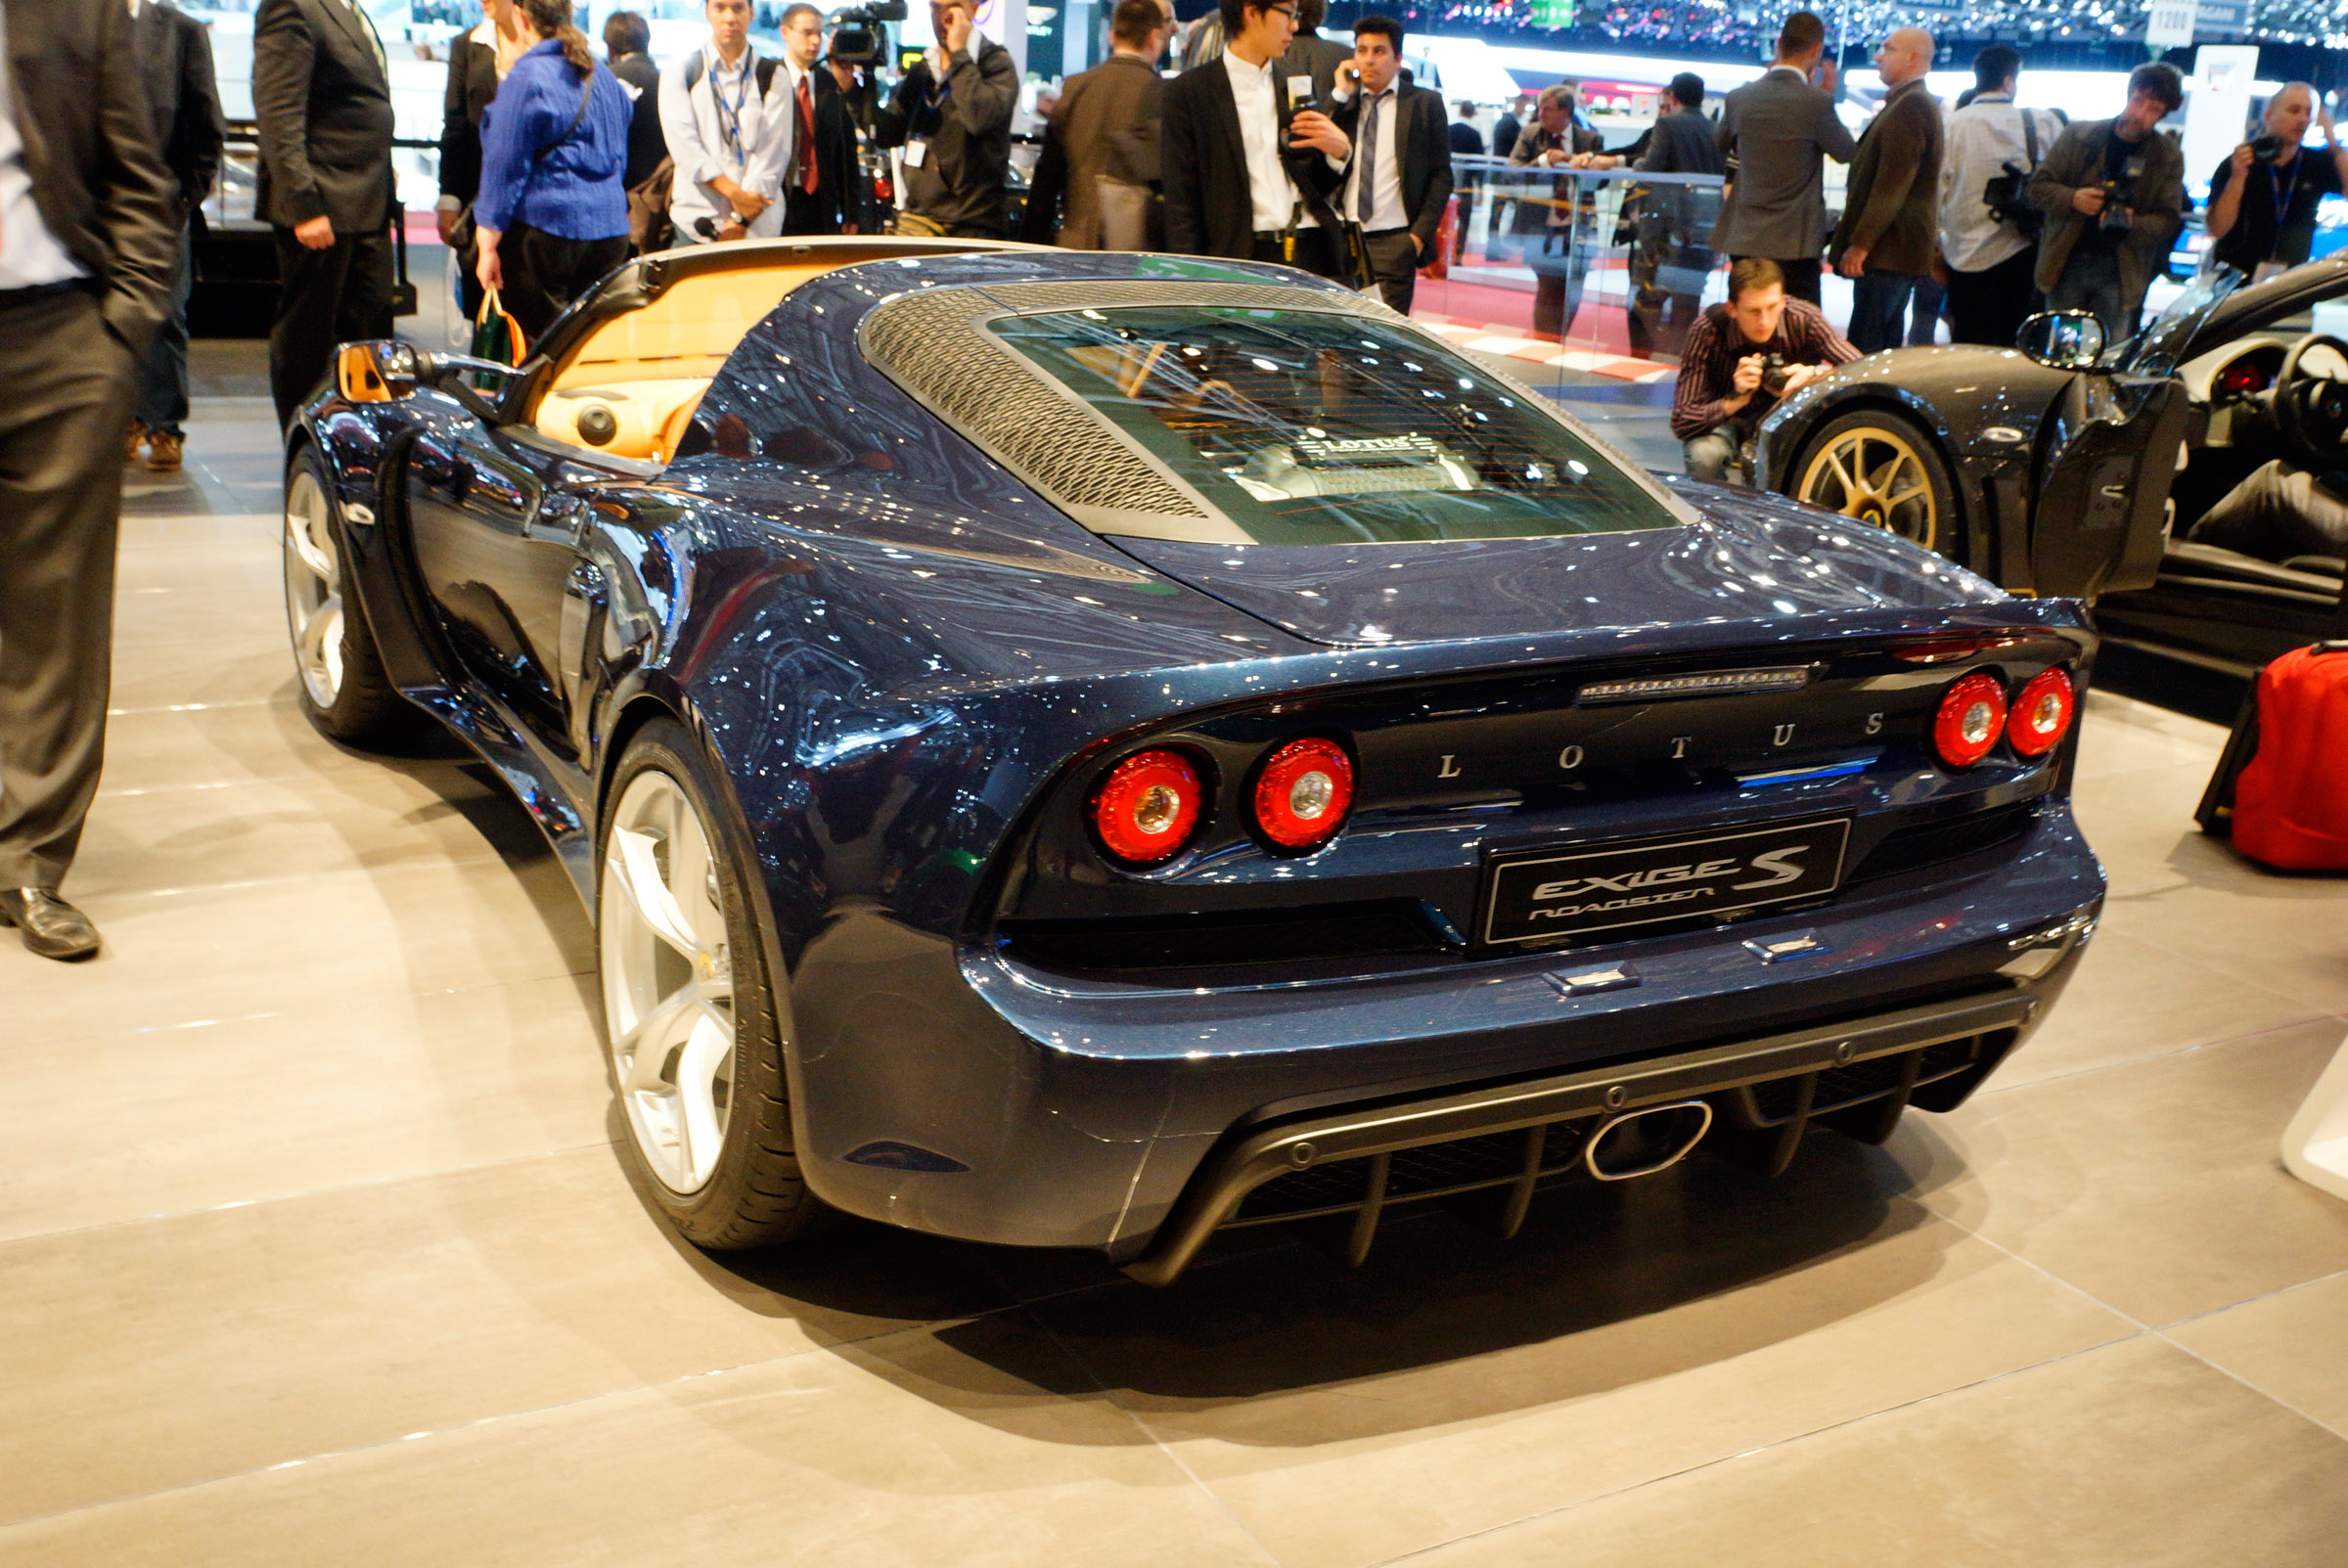 https://www.automobilesreview.com/gallery/lotus-exige-s-roadster-geneva-2012/lotus-exige-s-roadster-geneva-2012-02.jpg